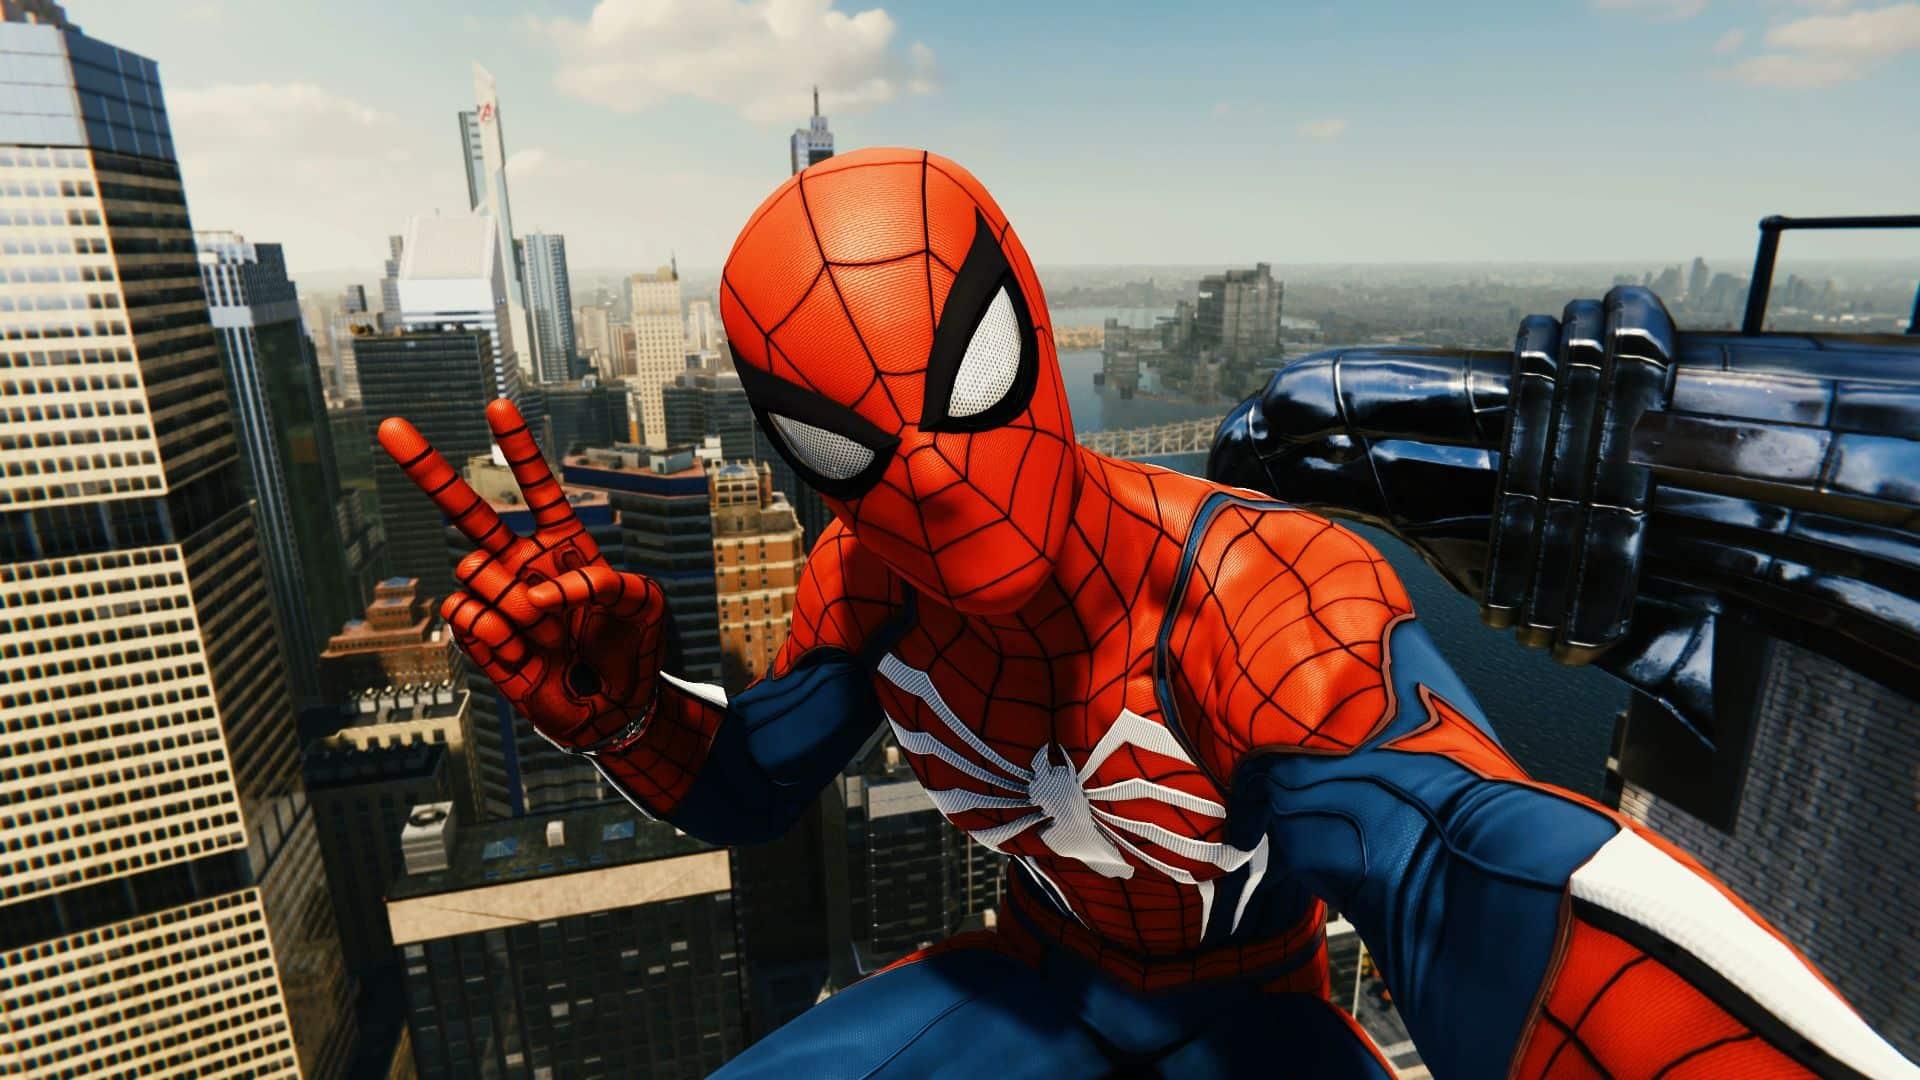 Insomniac Games Sunset Overdrive Spider-Man